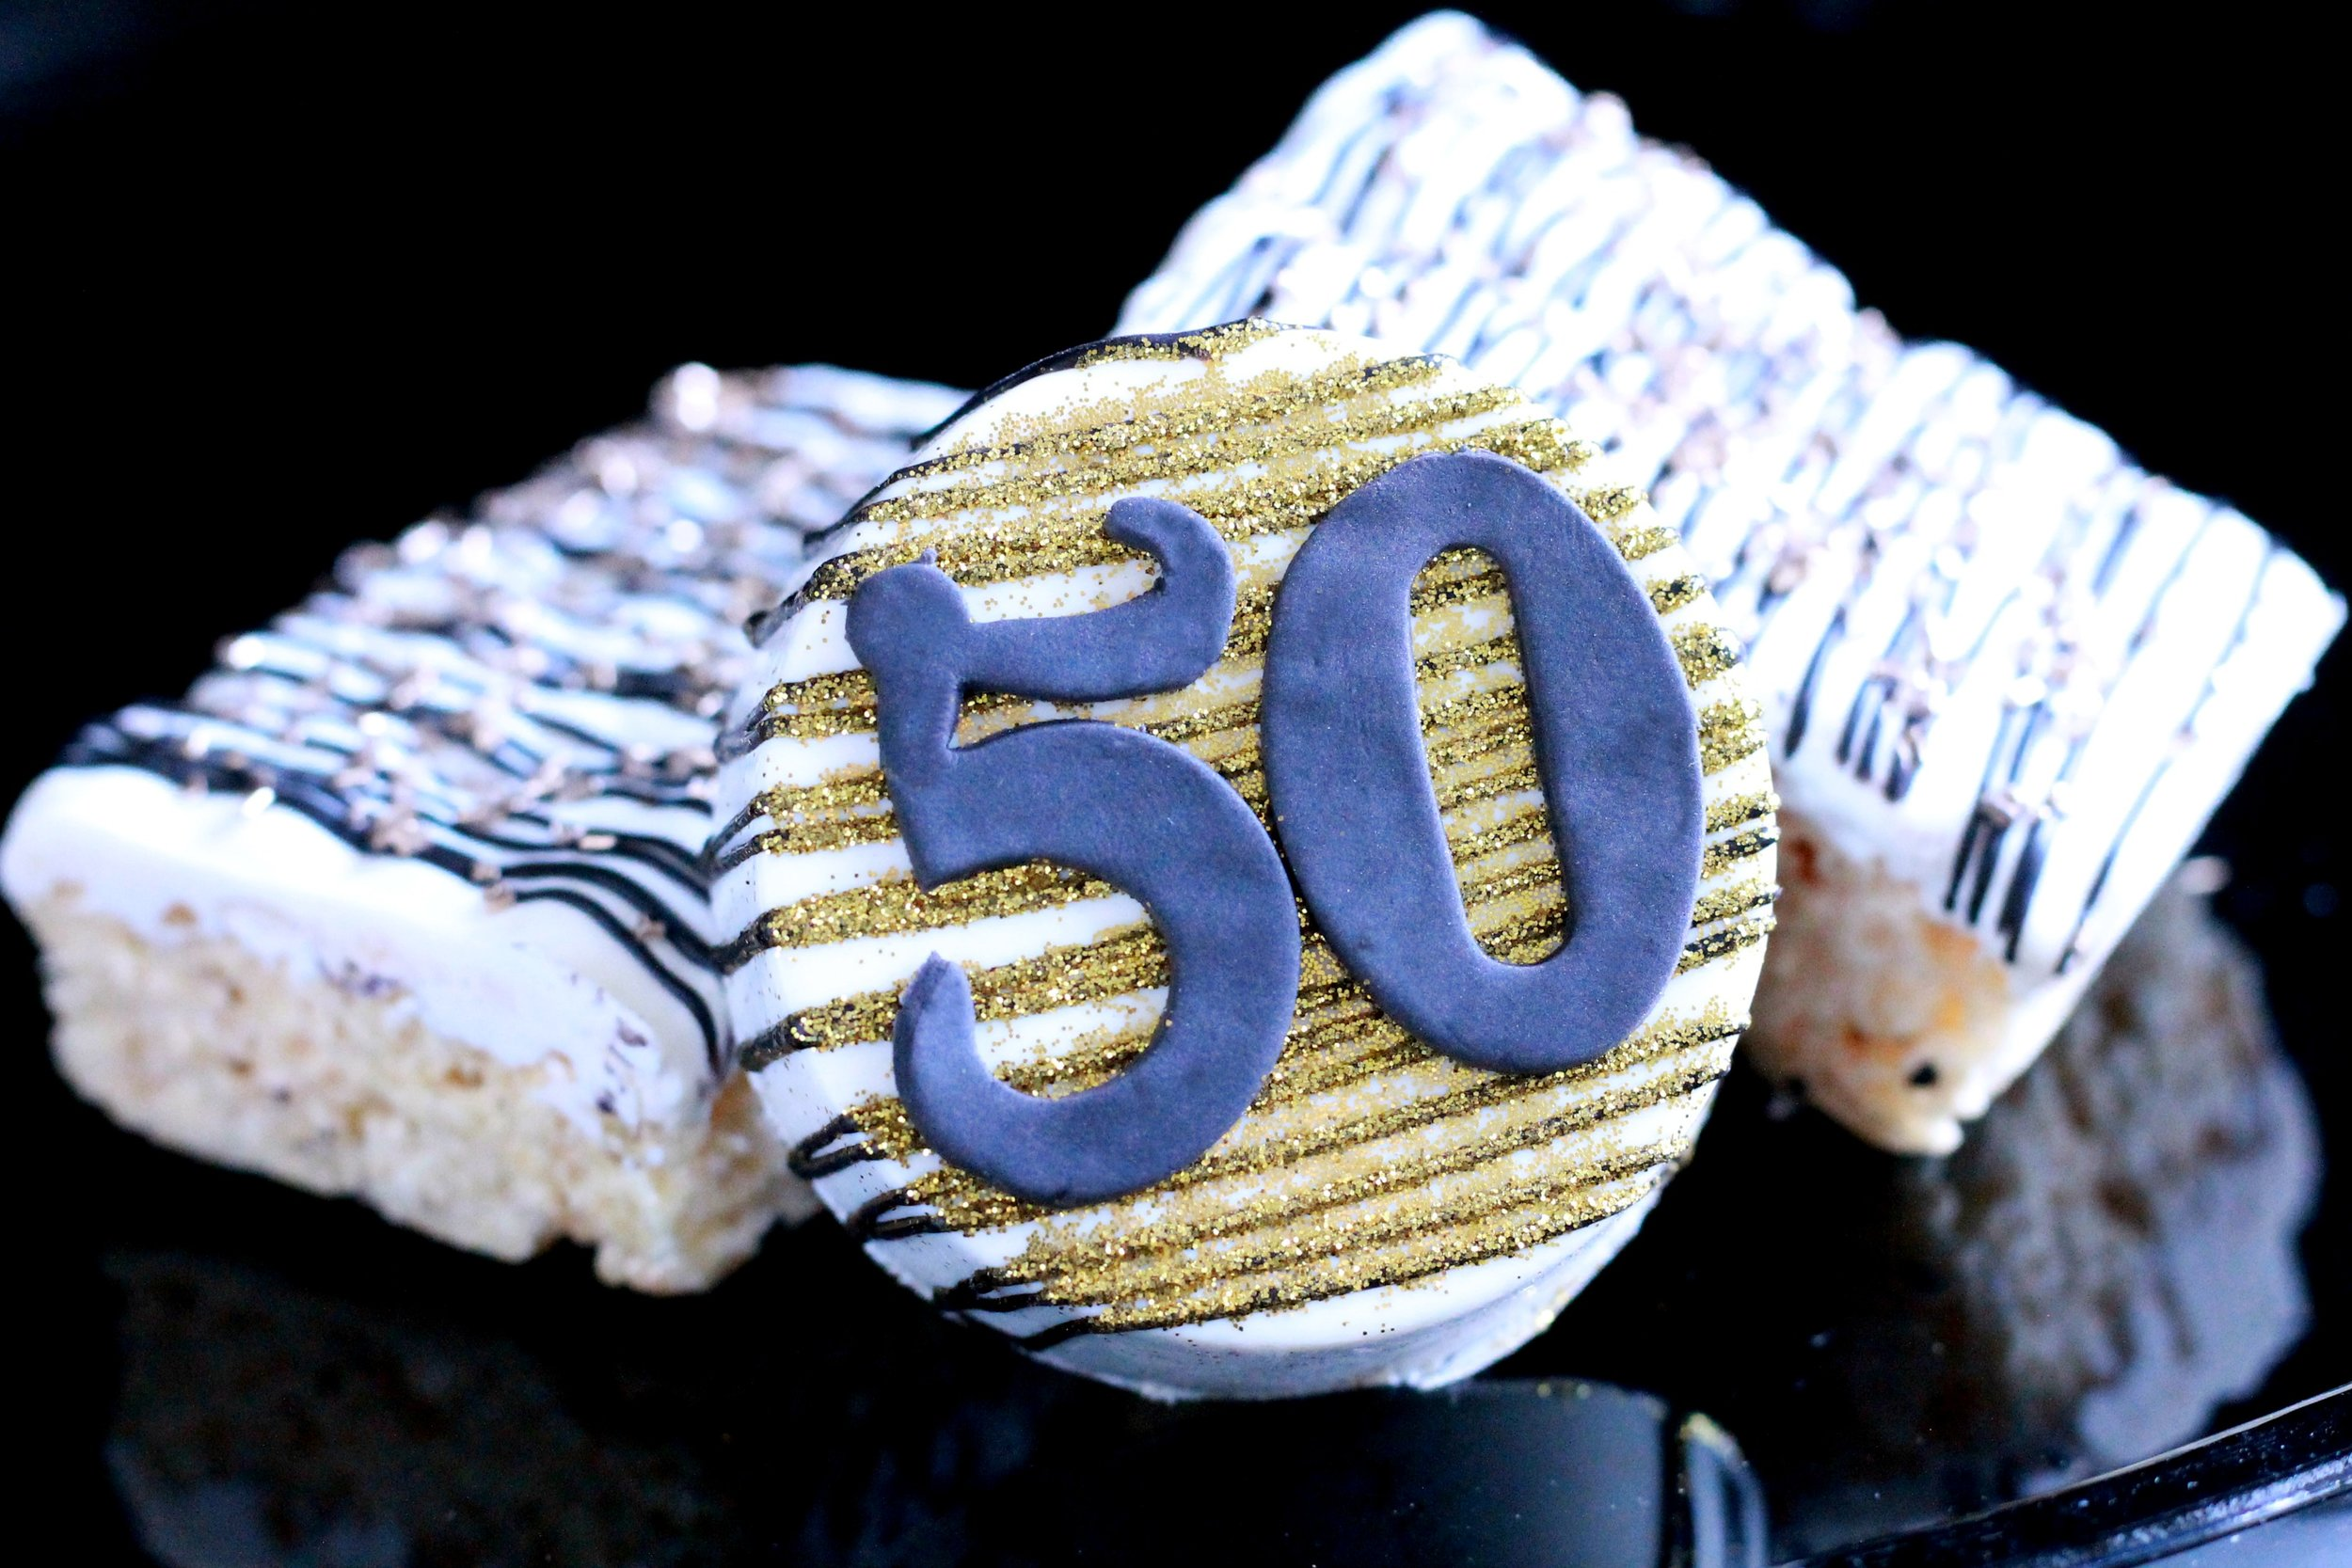 50TH birthday-50 birthday party ideas-50th birthday desserts-chocolate covered oreos-50-cheers to 50 years-black and gold birthday-www.SugarPartiesLA.COM.jpg